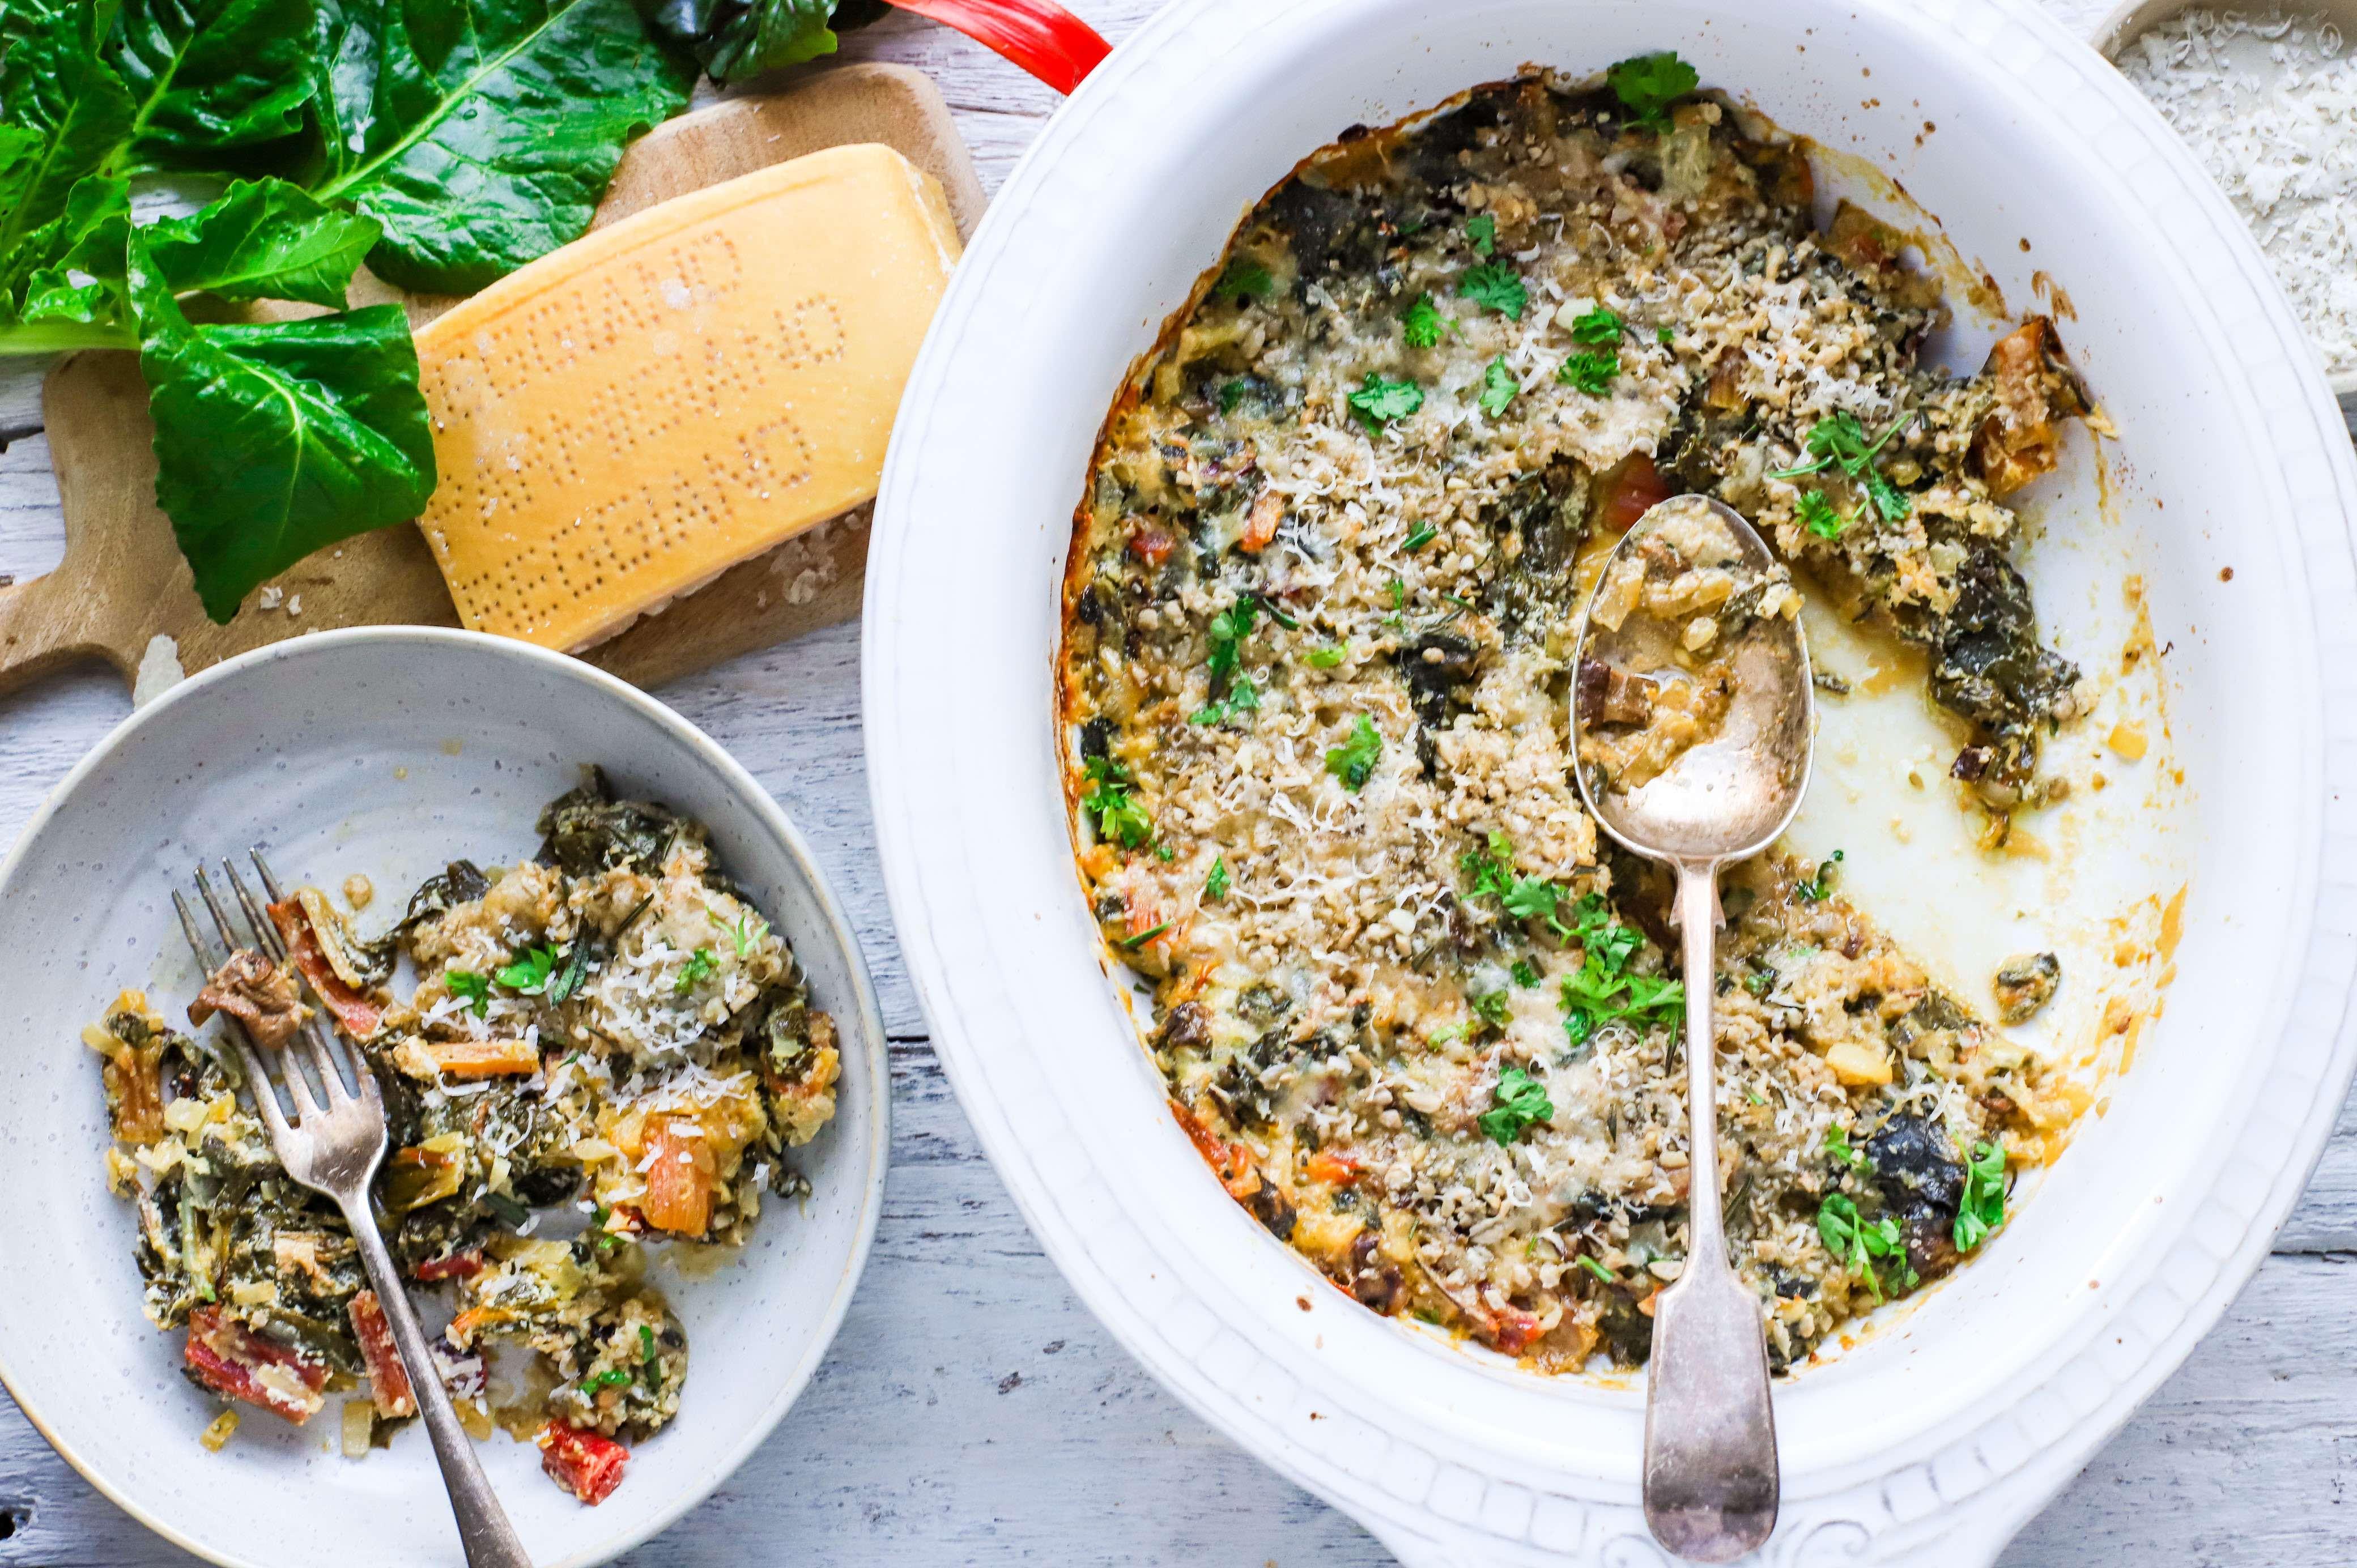 chard and porcini mushroom gratin